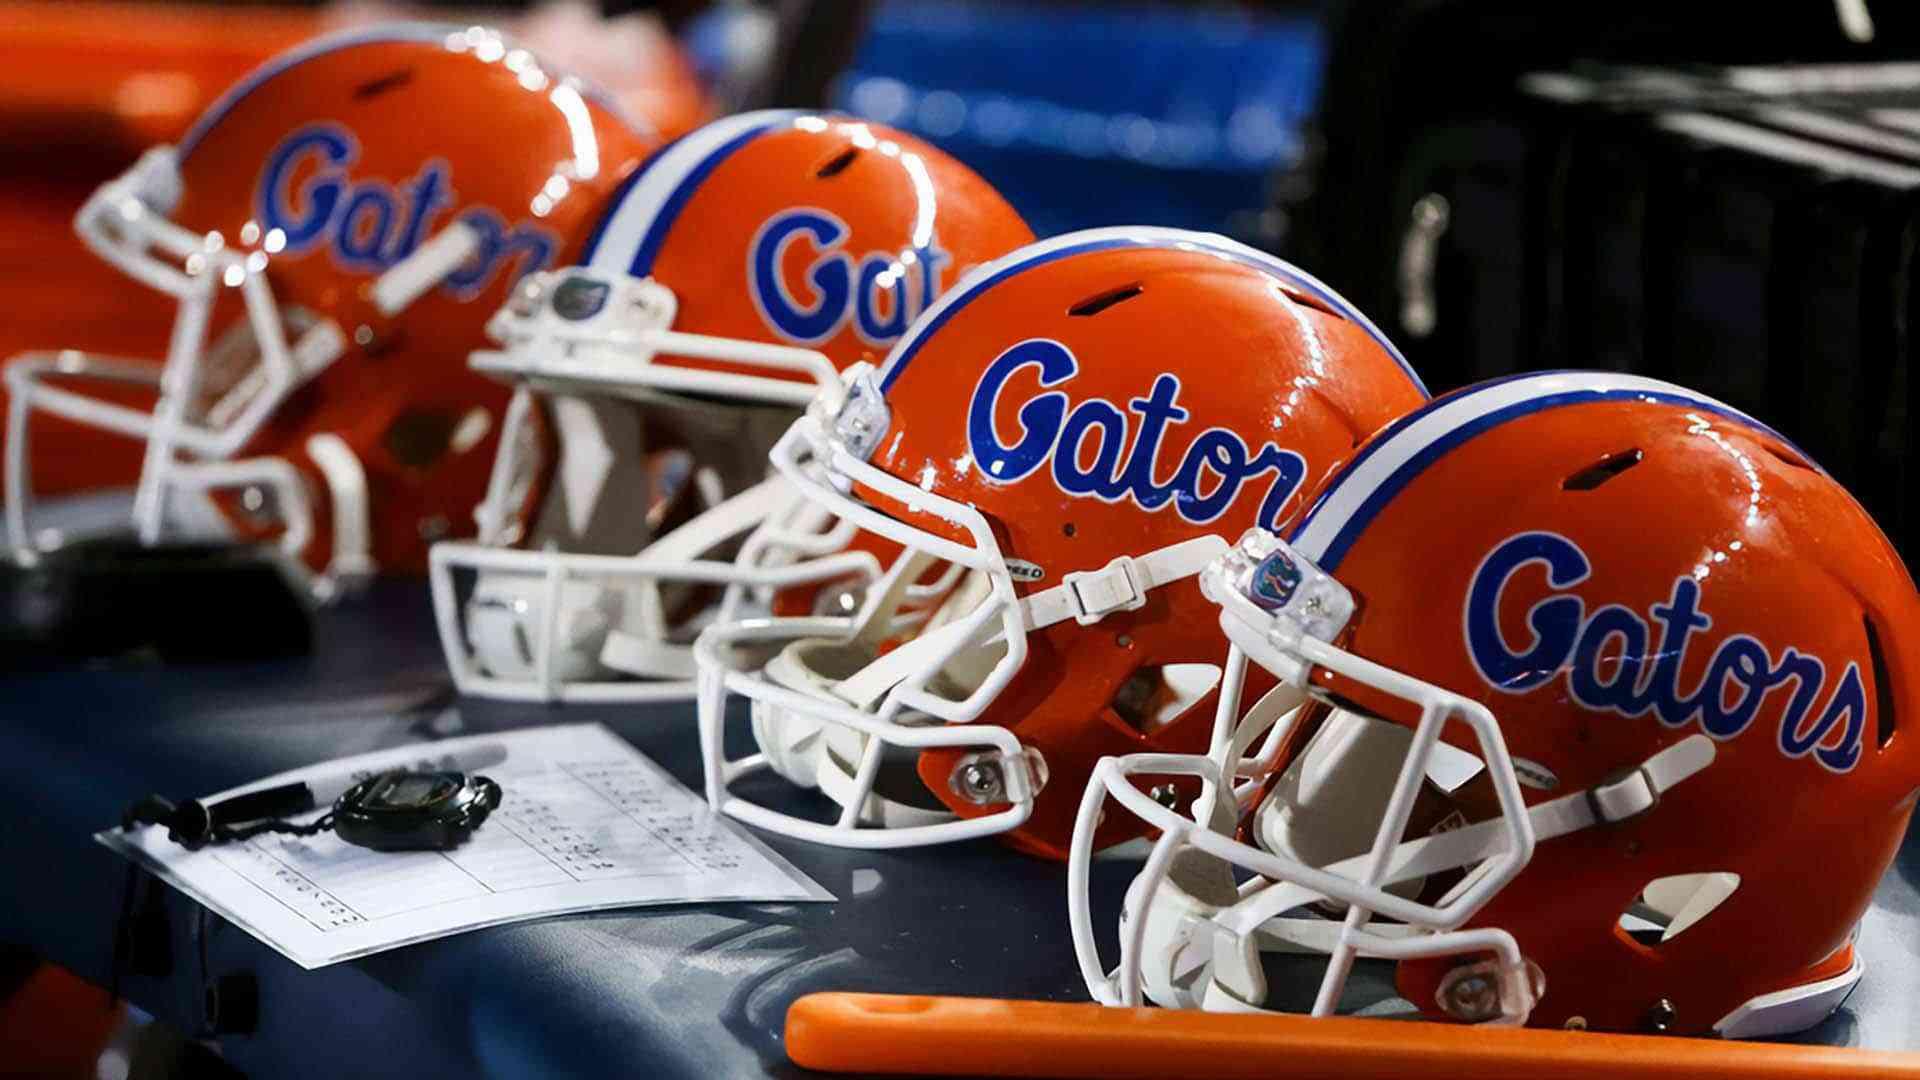 Florida Gators helmets Gatorade technology transfer example